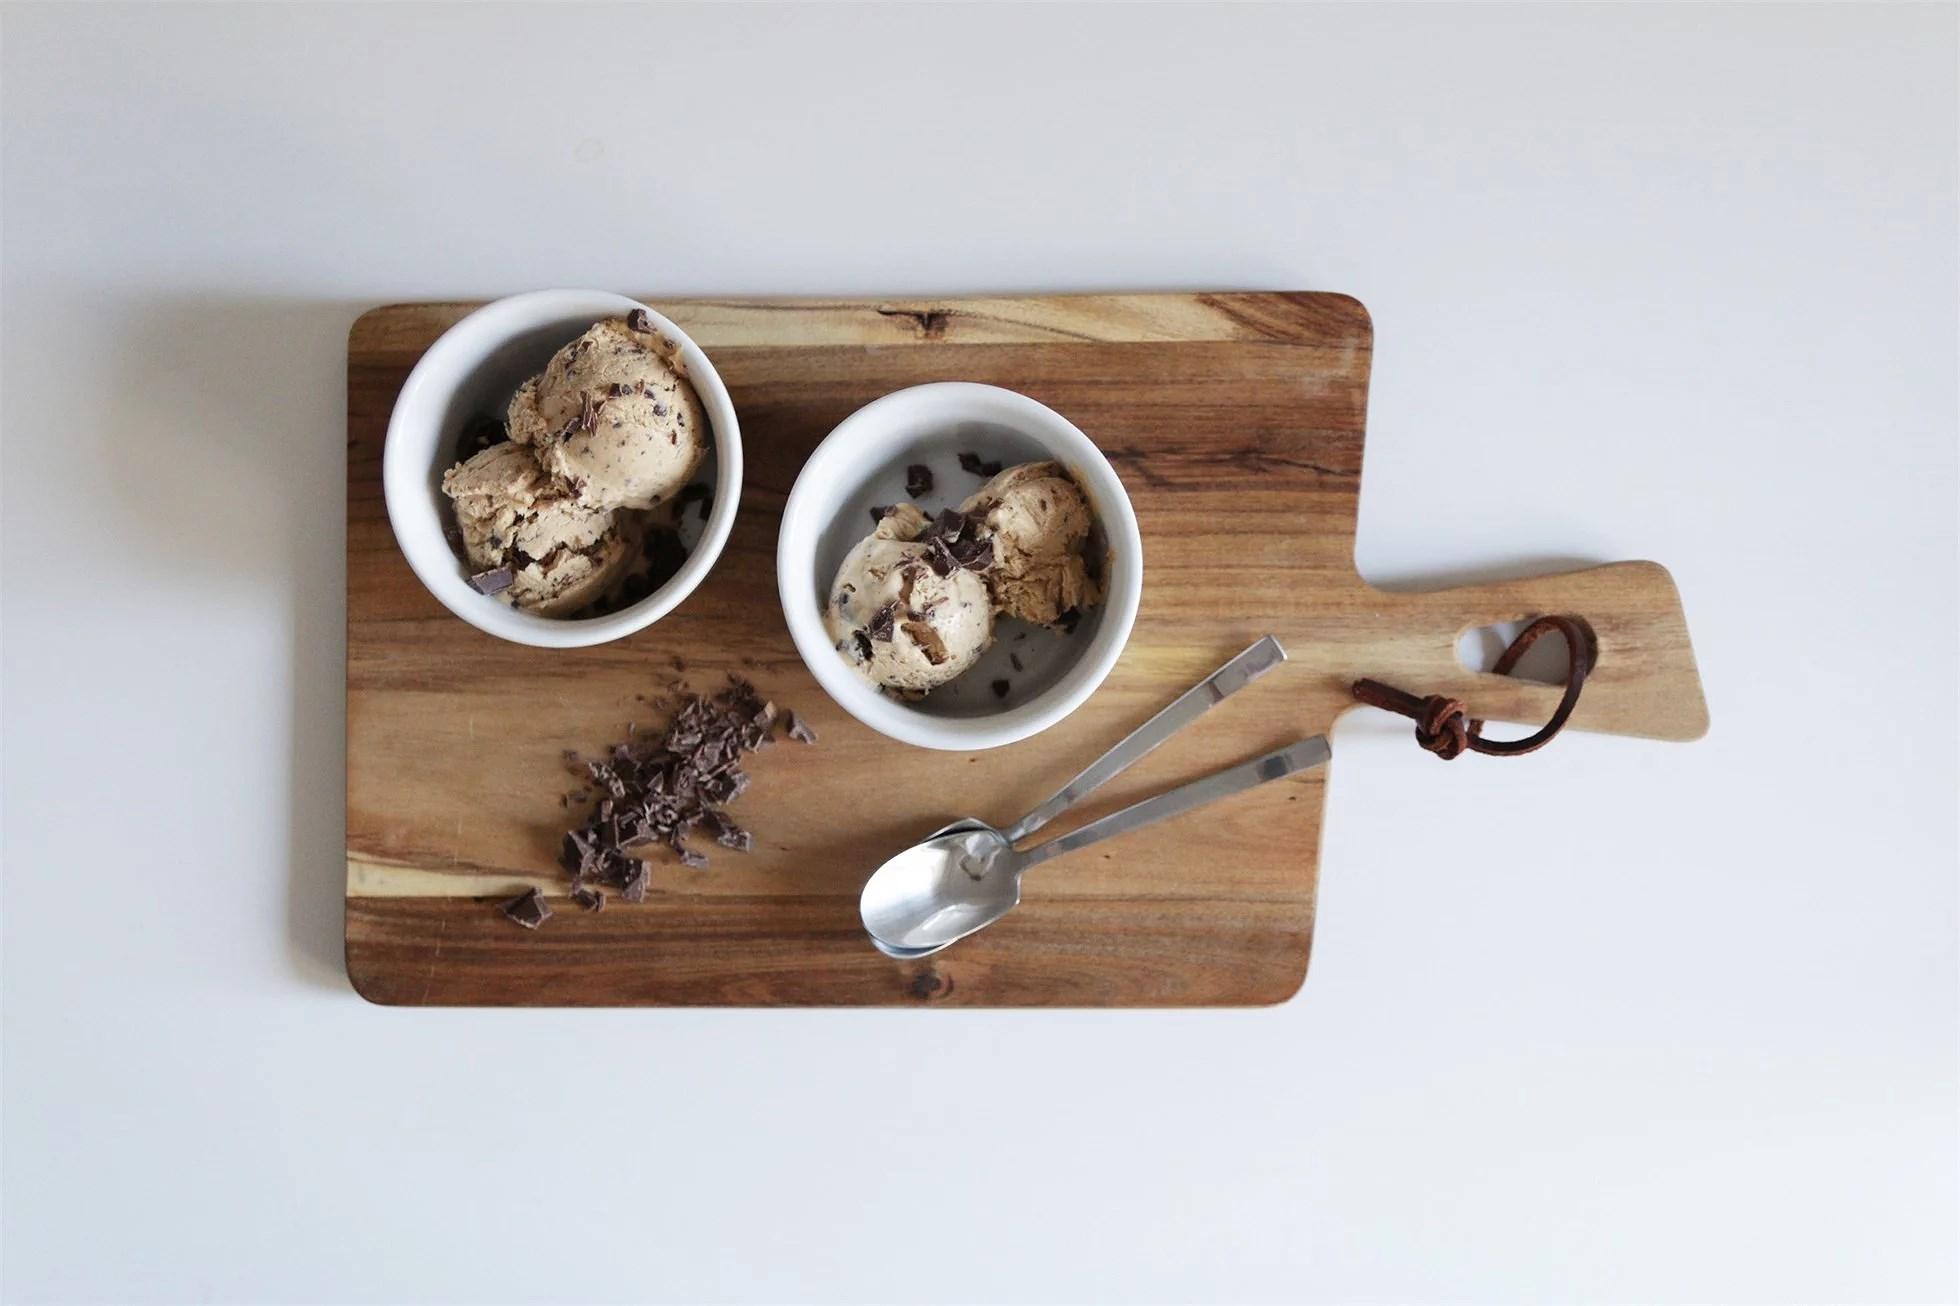 RECIPE/HOMEMADE CHOCOLATE ICE CREAM